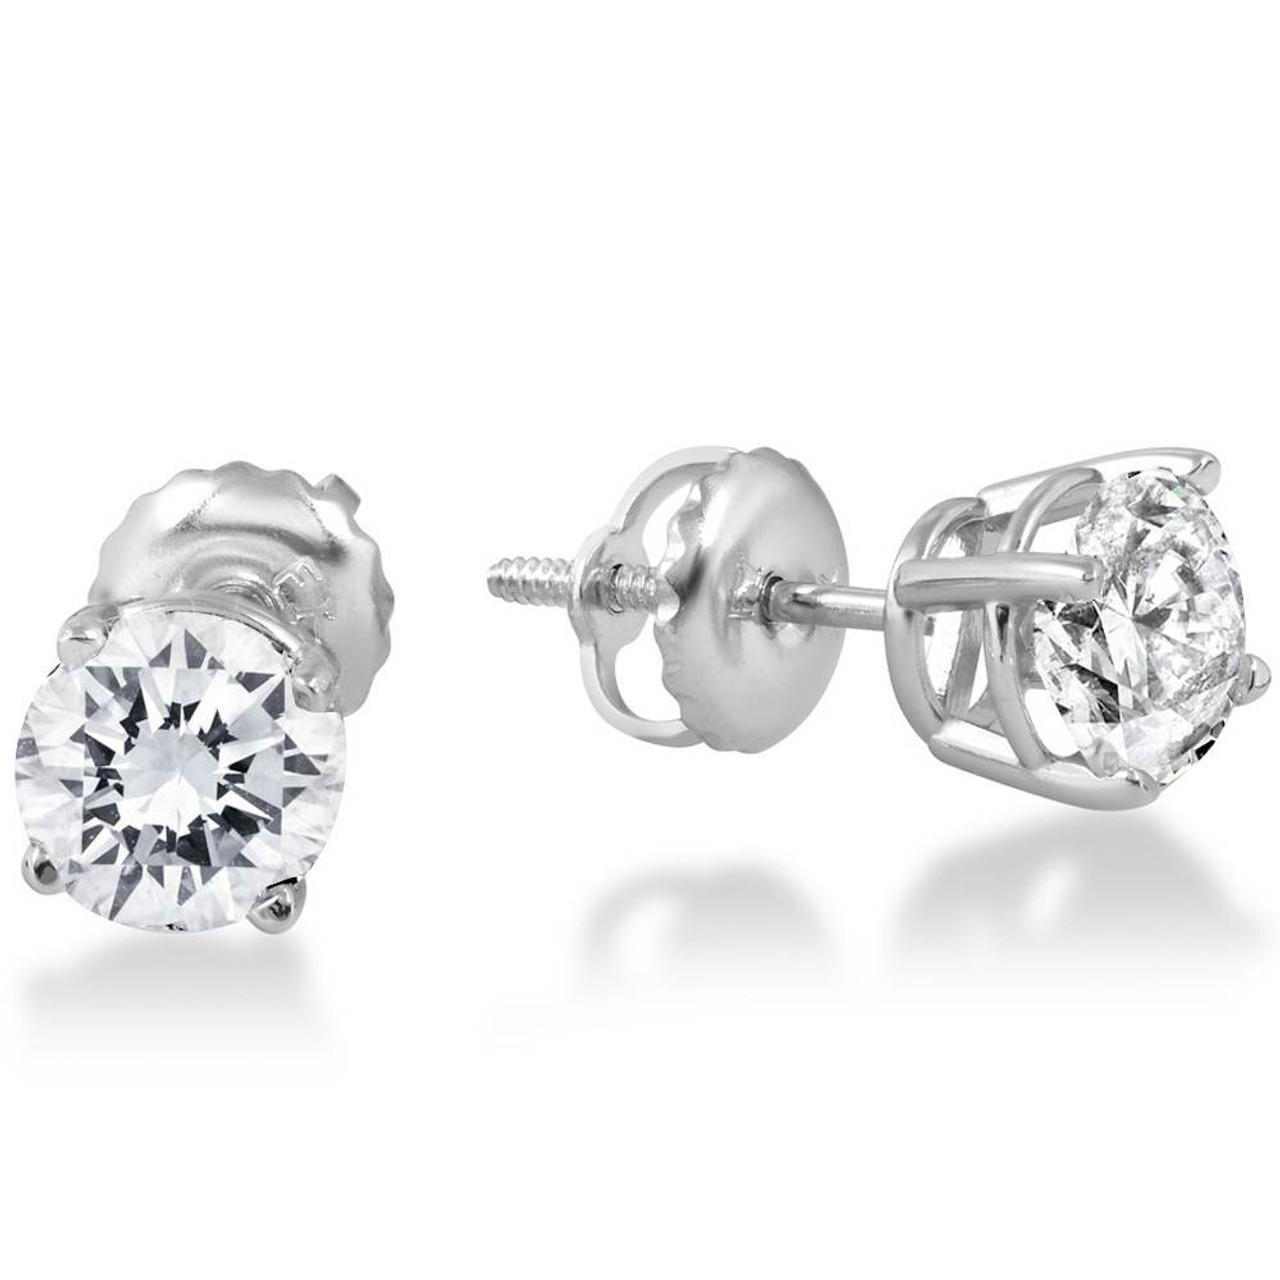 b78358c64decb 1ct Round Diamond Stud Earrings in 14K Whte Gold with Screw Backs (I-J,  I2-3)